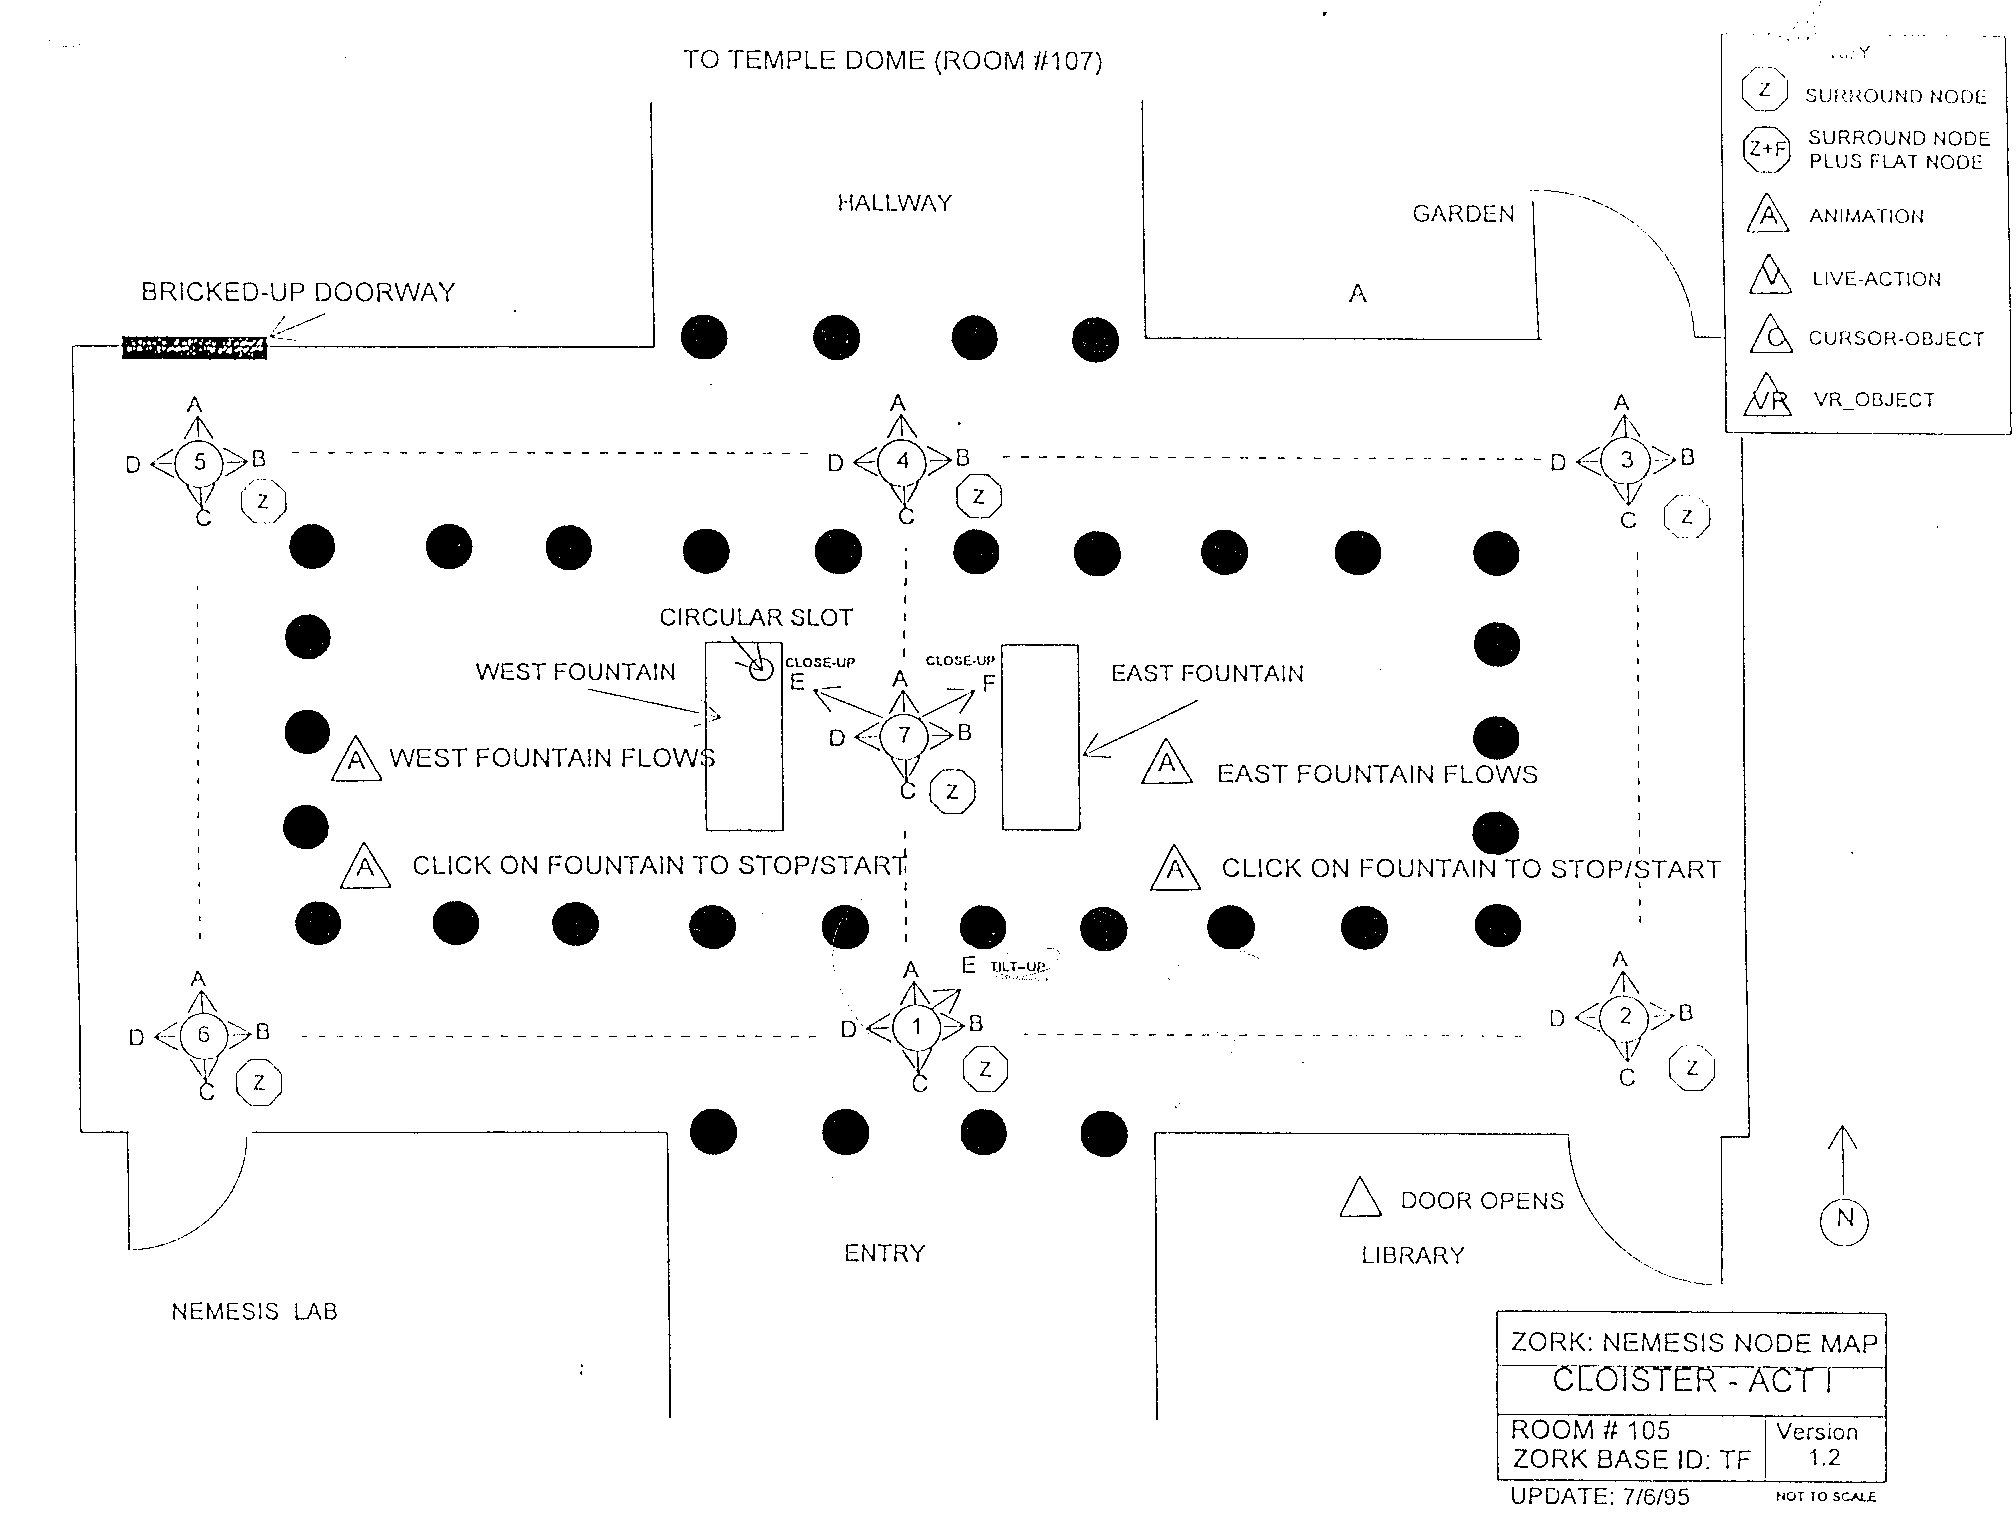 Zork Nemesis Node Maps